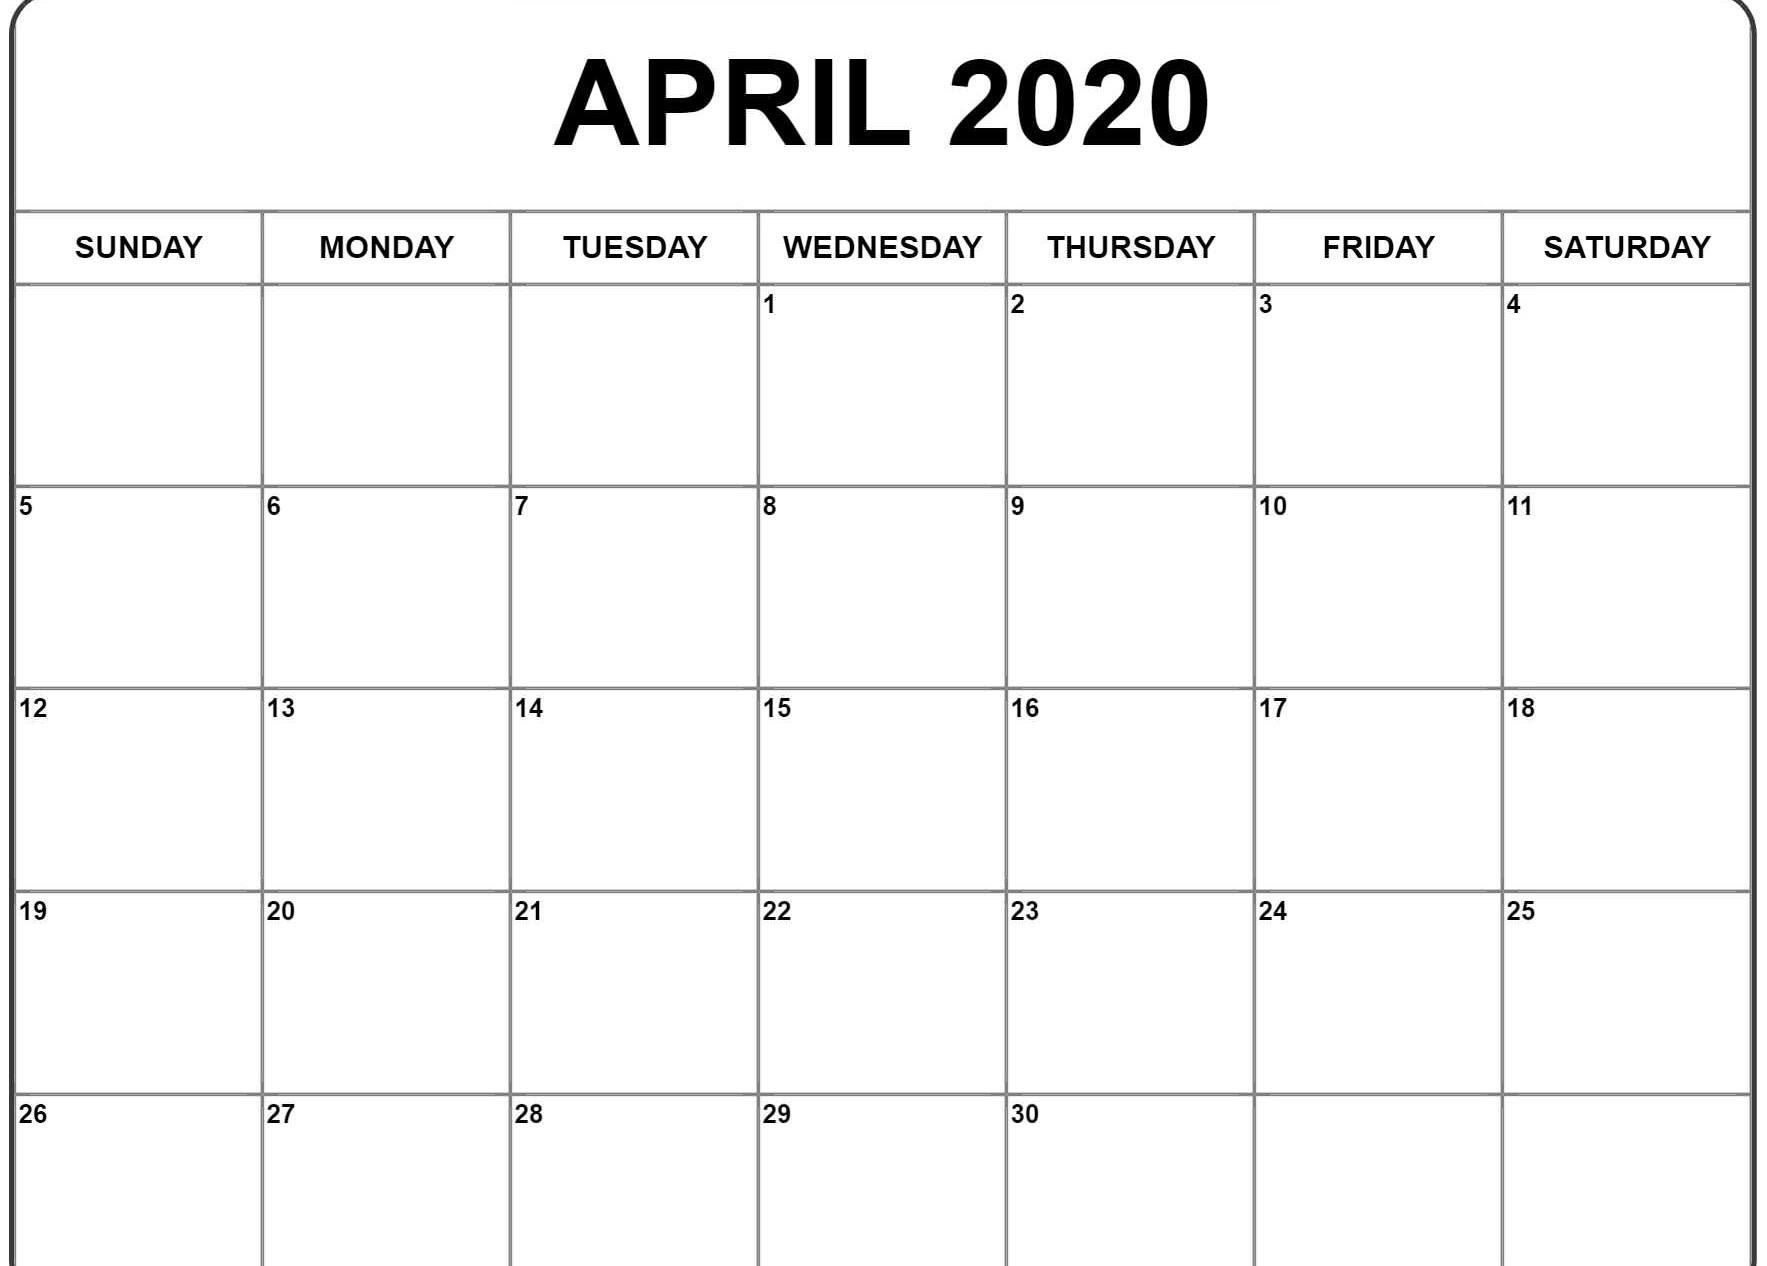 April 2020 Calendar Blank Template